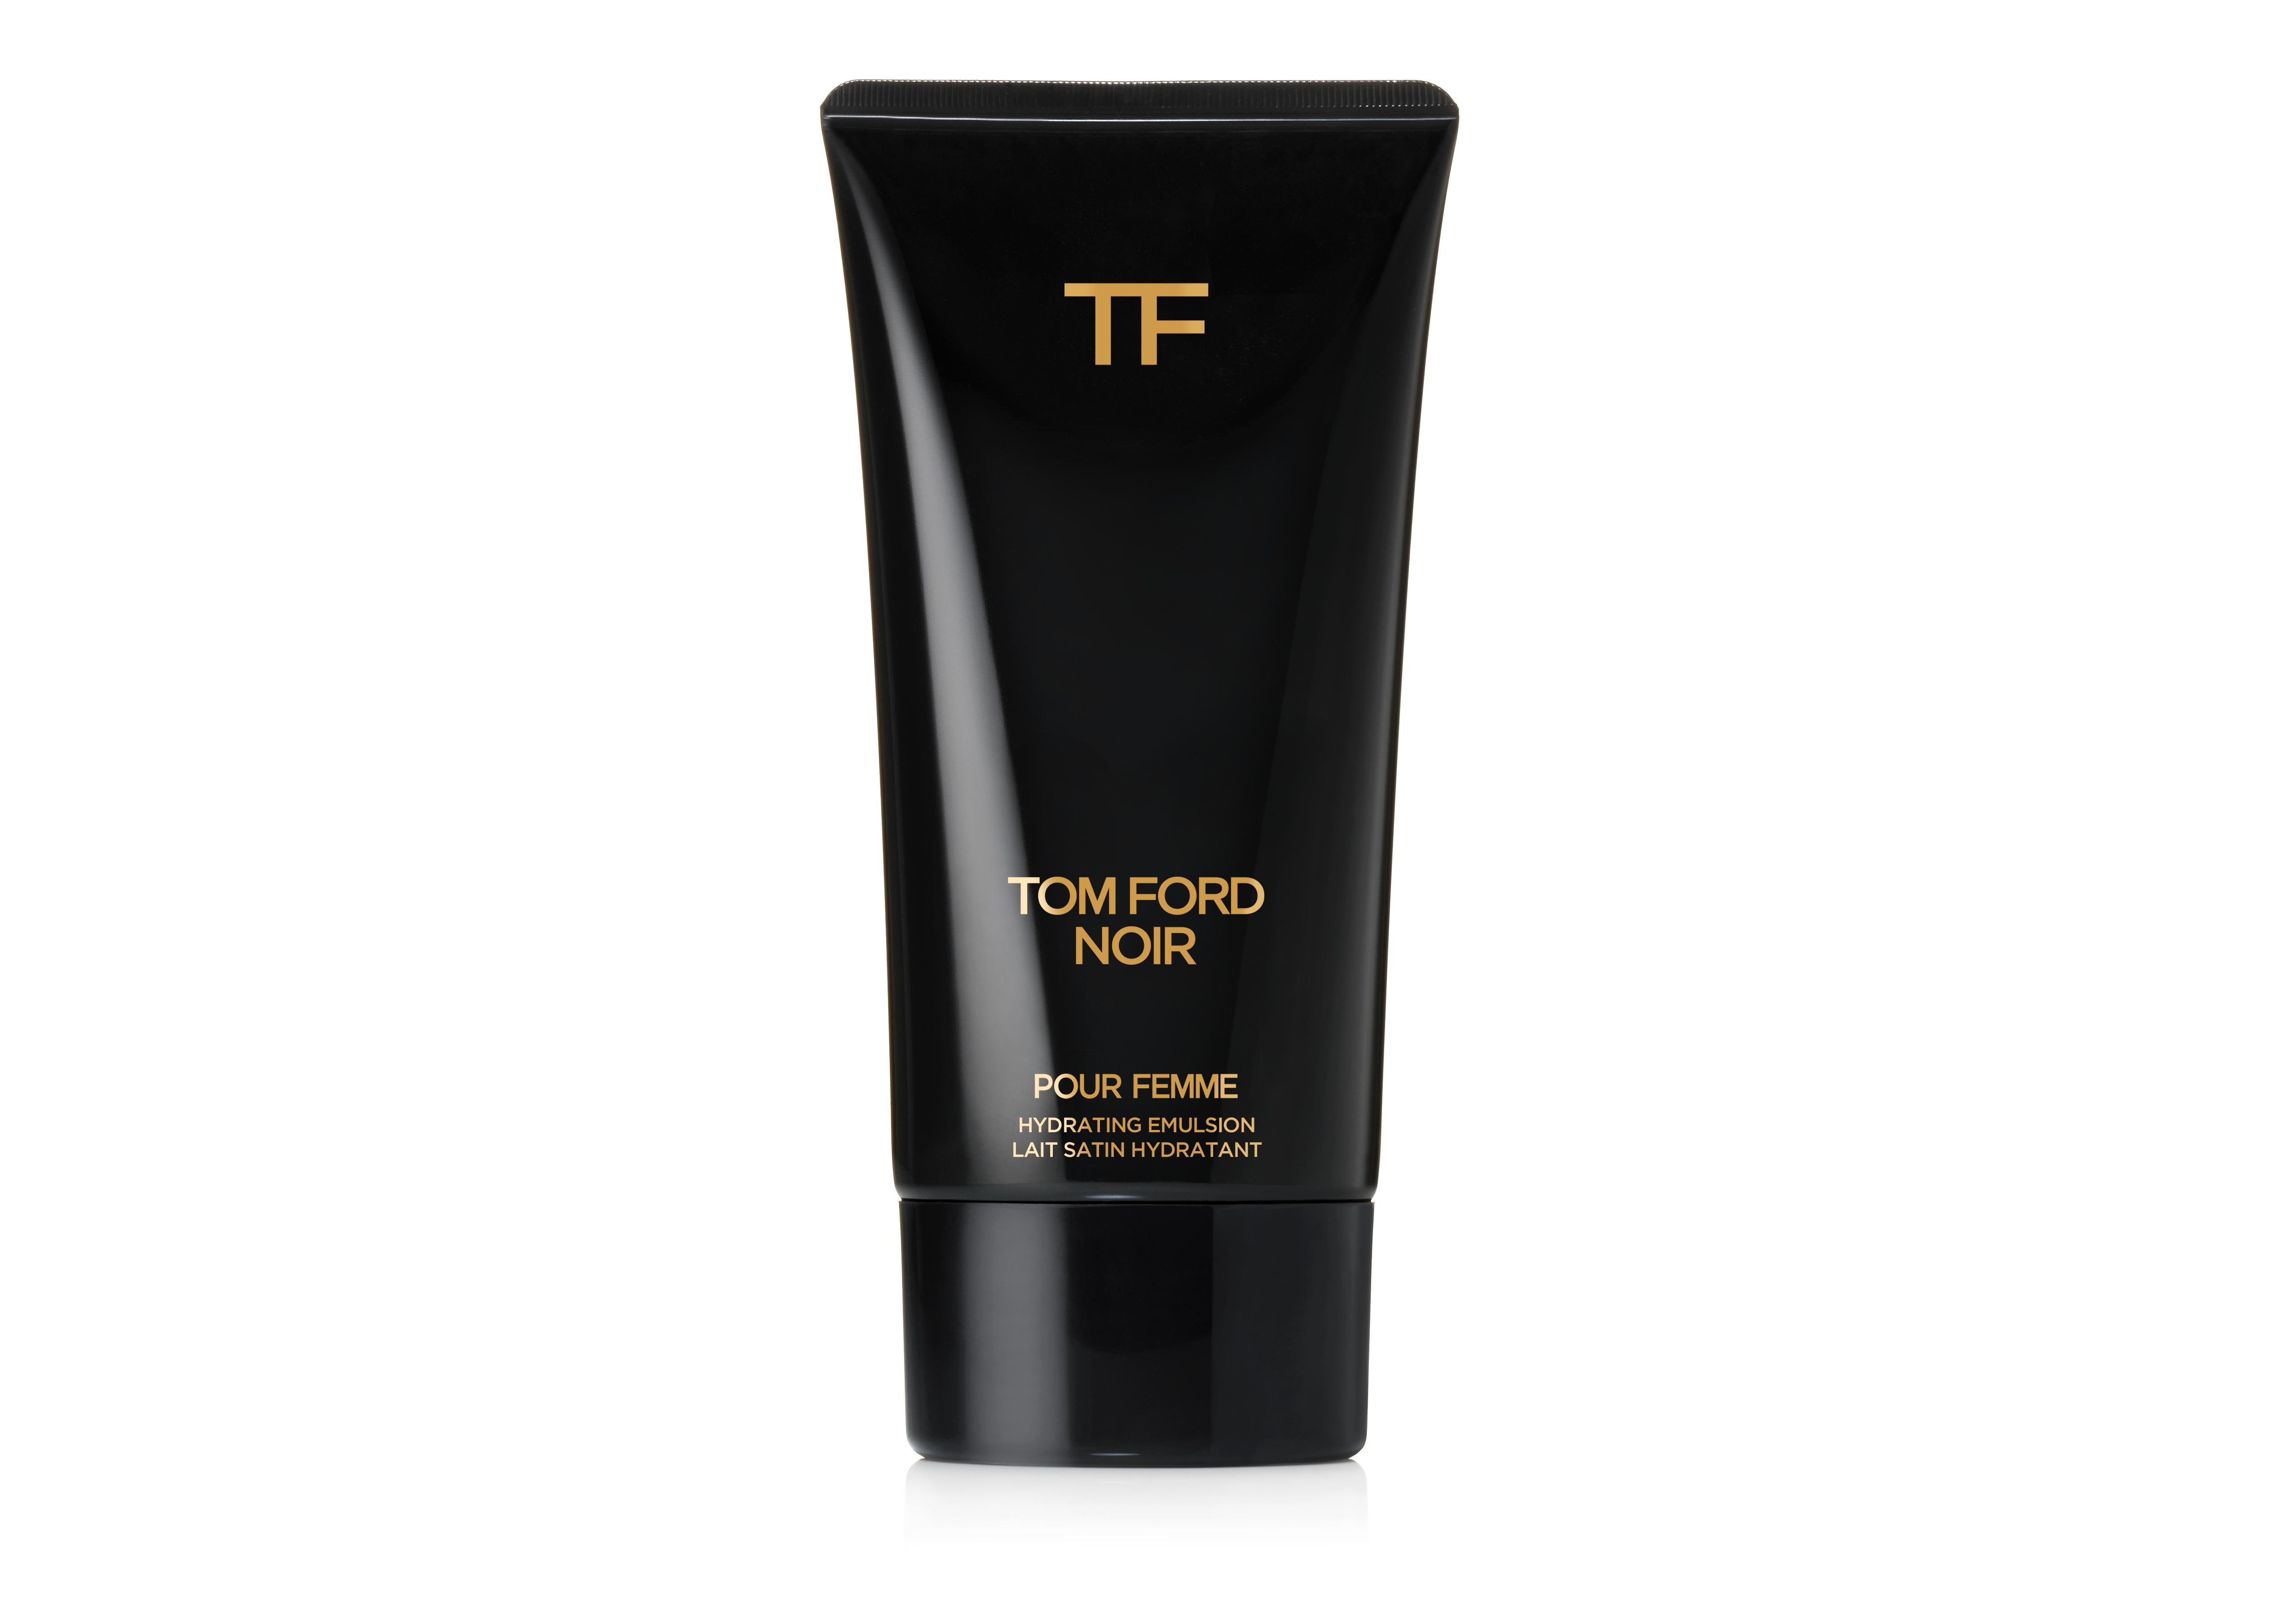 Tom Ford Noir Pour Femme Body Moisturizer A thumbnail